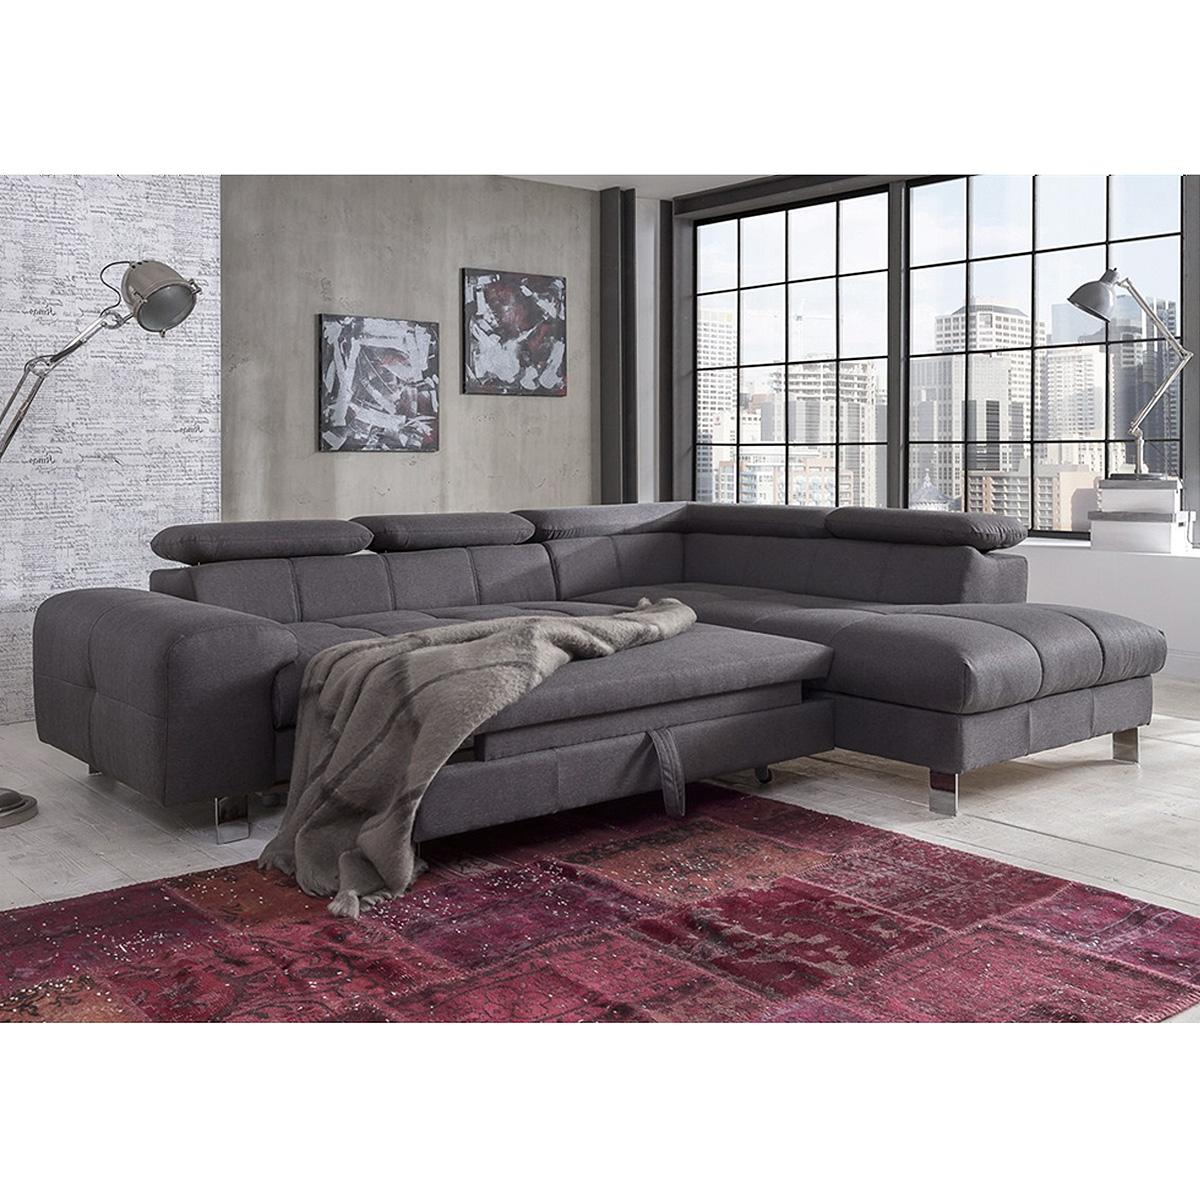 big sofa eckcouch peterborough charity ecksofa presidente wohnlandschaft polsterecke ...